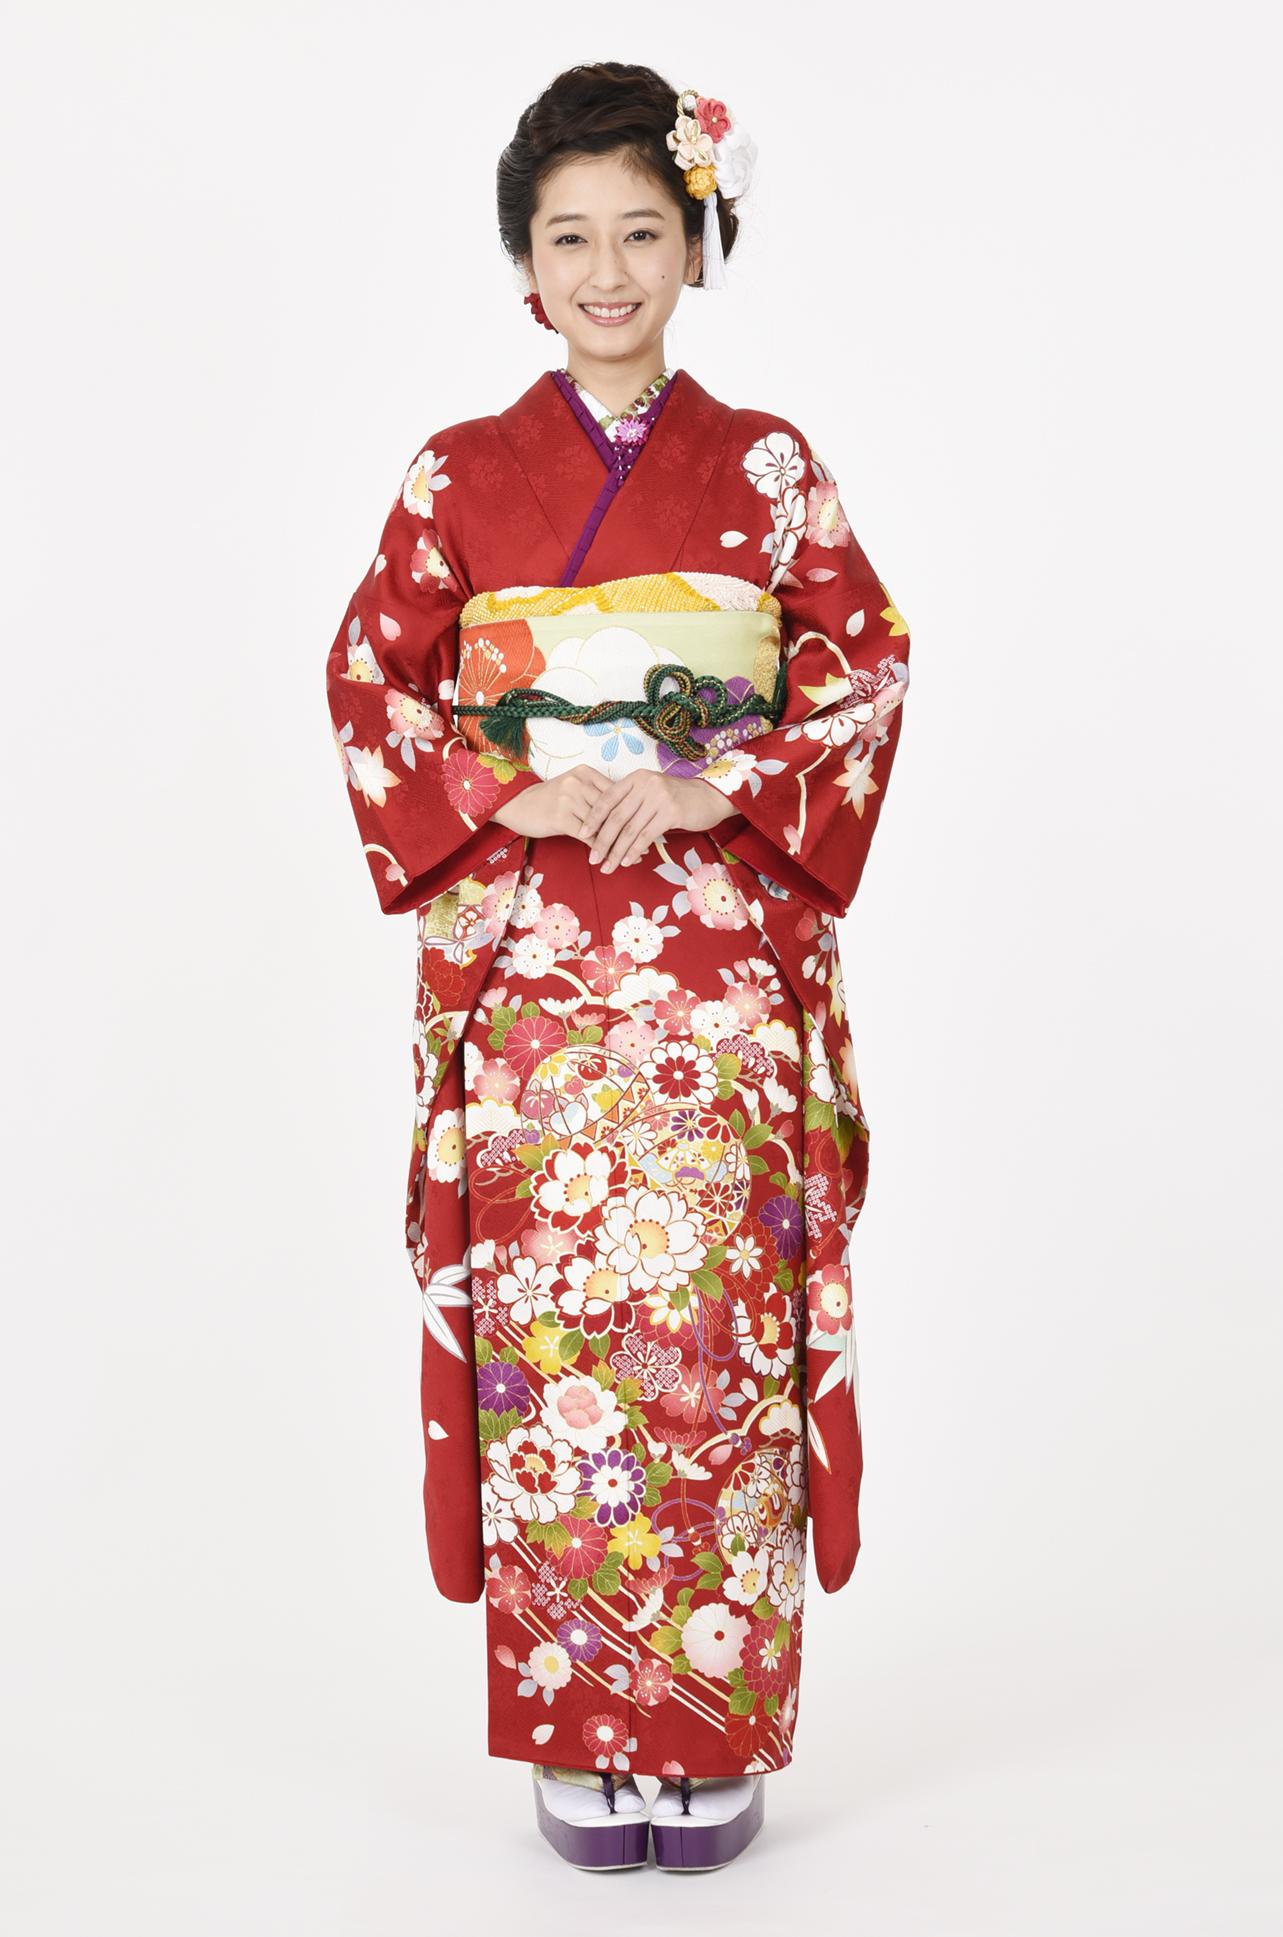 【MKK-2905】★赤地に愛らしい桜と毬柄振袖